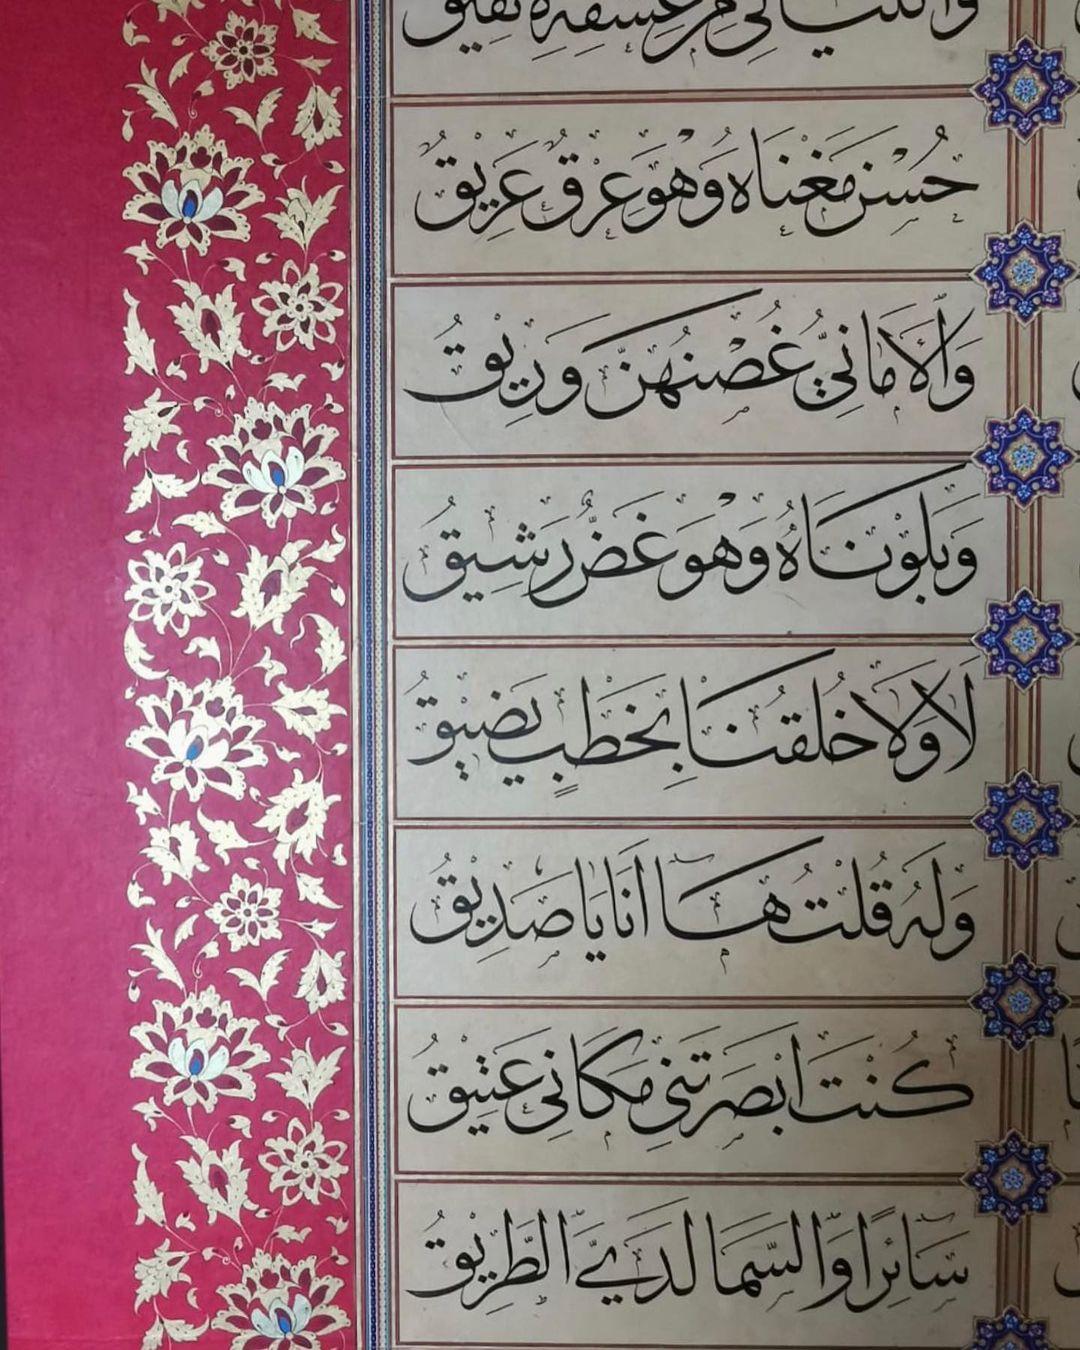 Professional Calligrapher Bijar Arbilly Calligraphy  اجزاء من عملي… قصيدة للشيخ محمد بن راشد آل مكتوم #calligraphy #kunst #art #tehra... 339 2